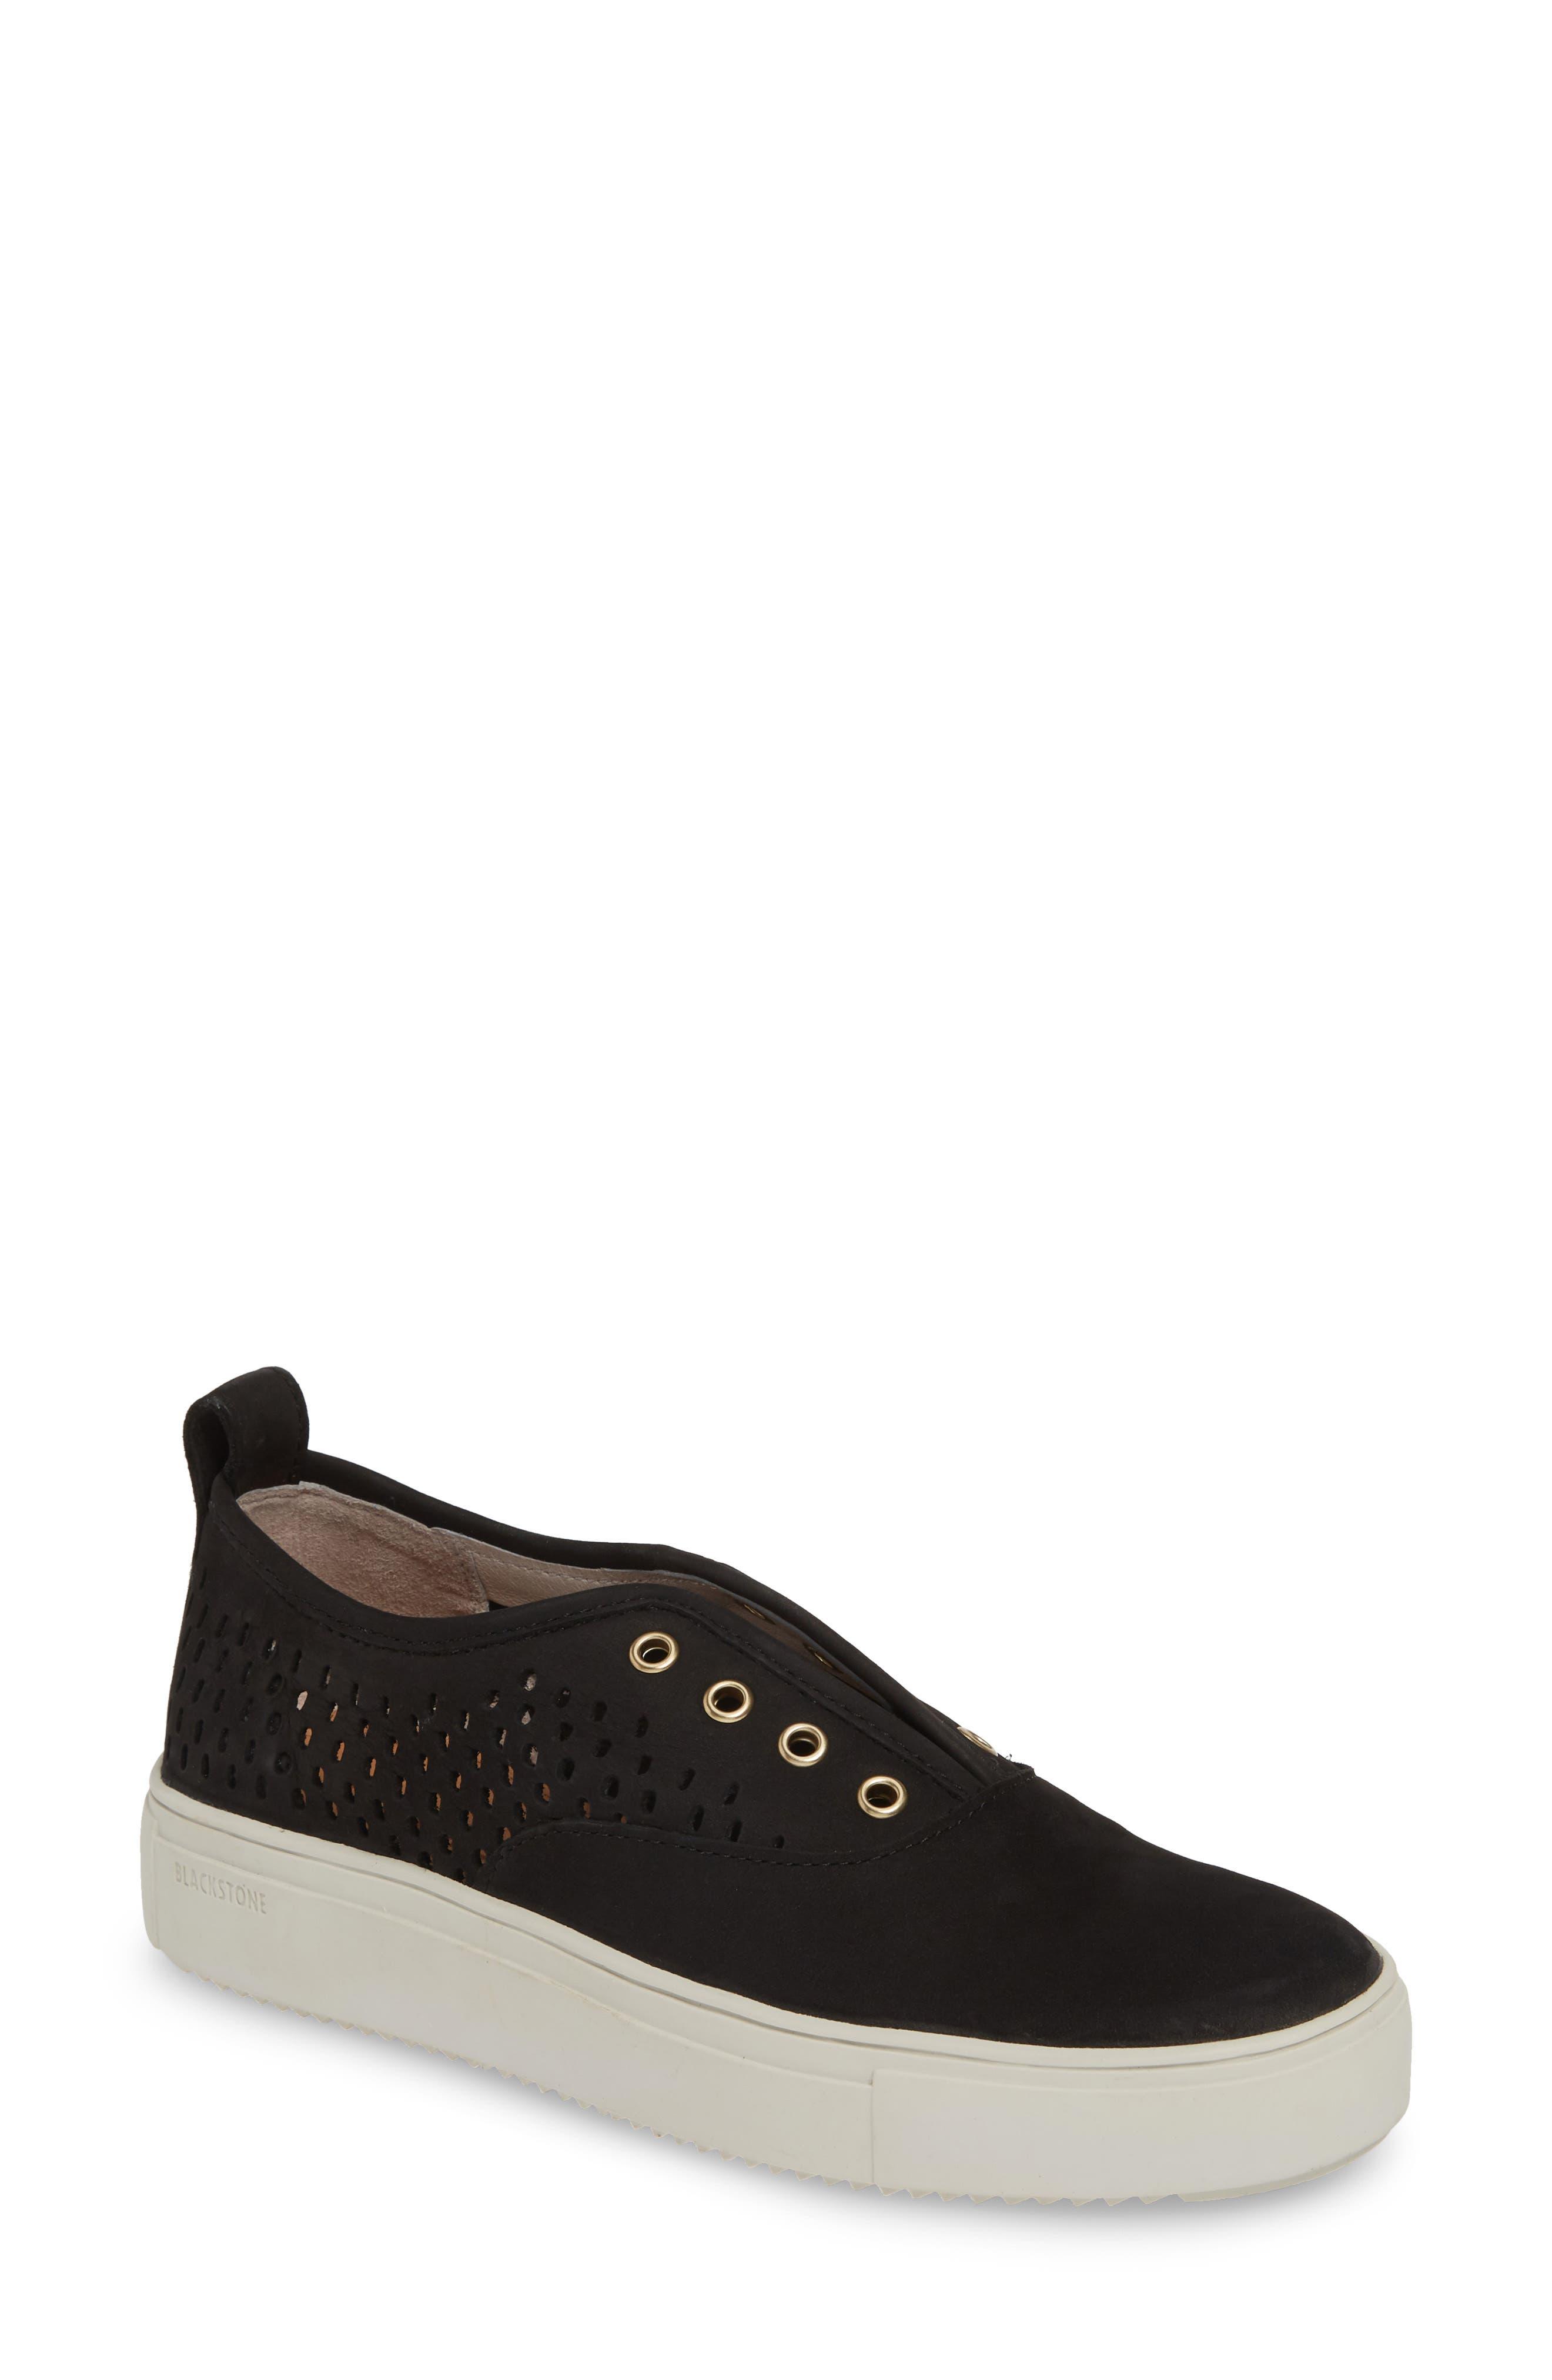 Blackstone Rl67 Laceless Perforated Sneaker, Black